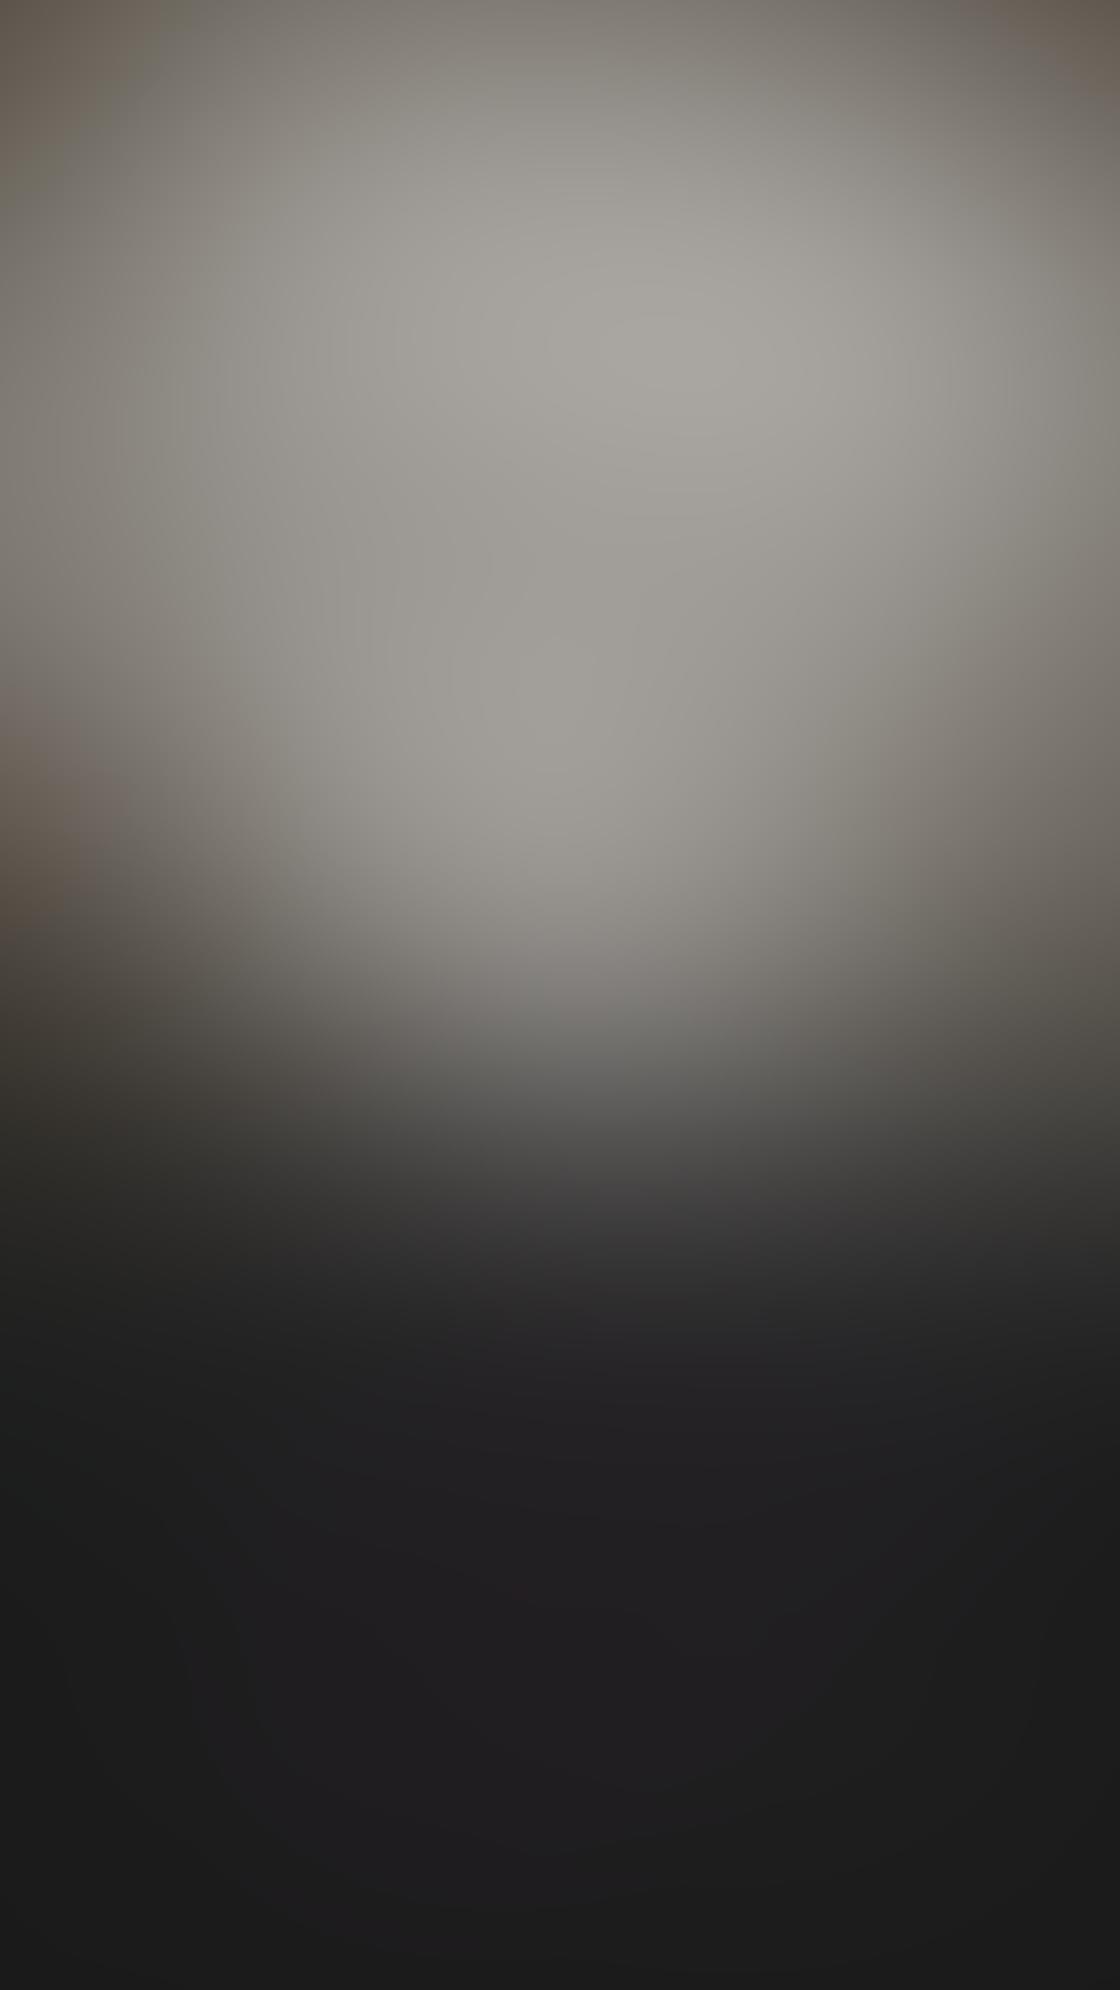 iPhone Photos Darkroom App 7